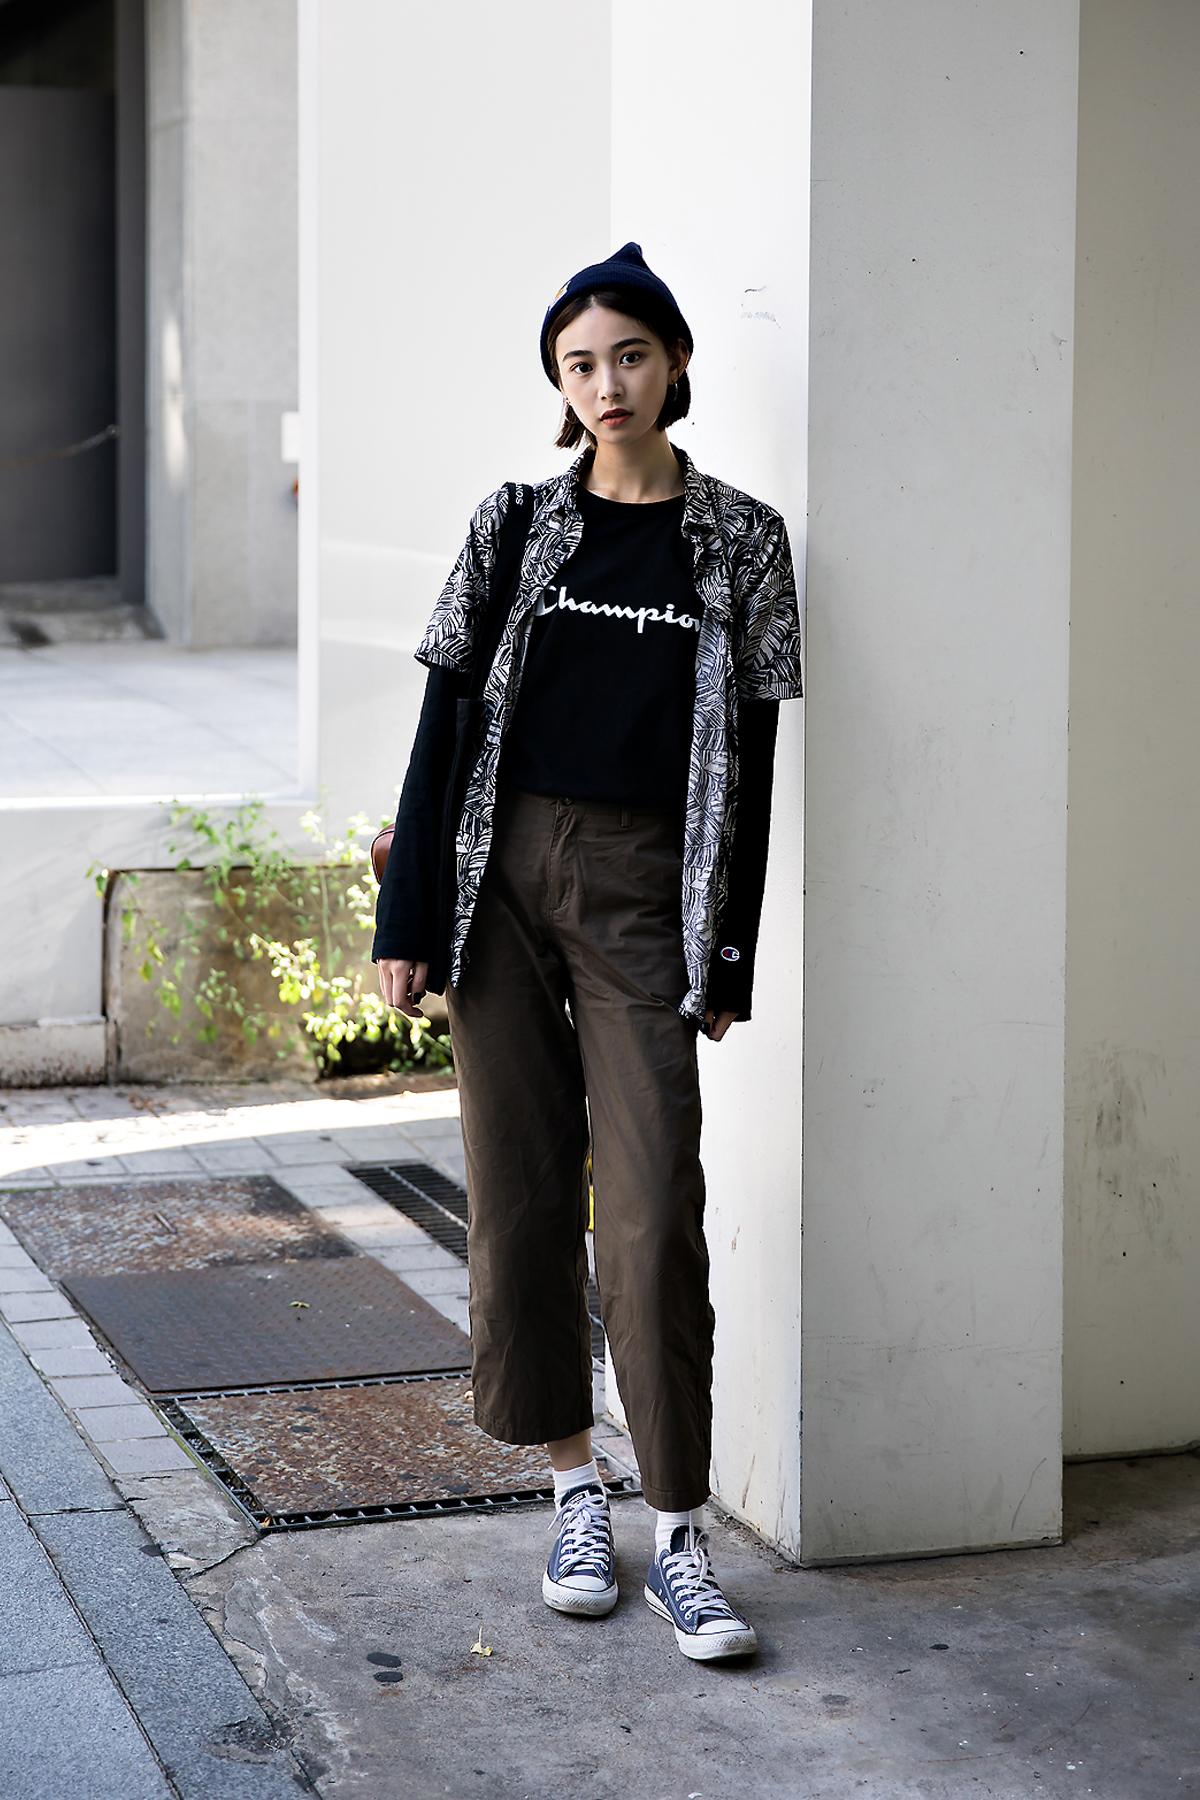 Jeung Mincheop, Street Fashion 2017 in Seoul